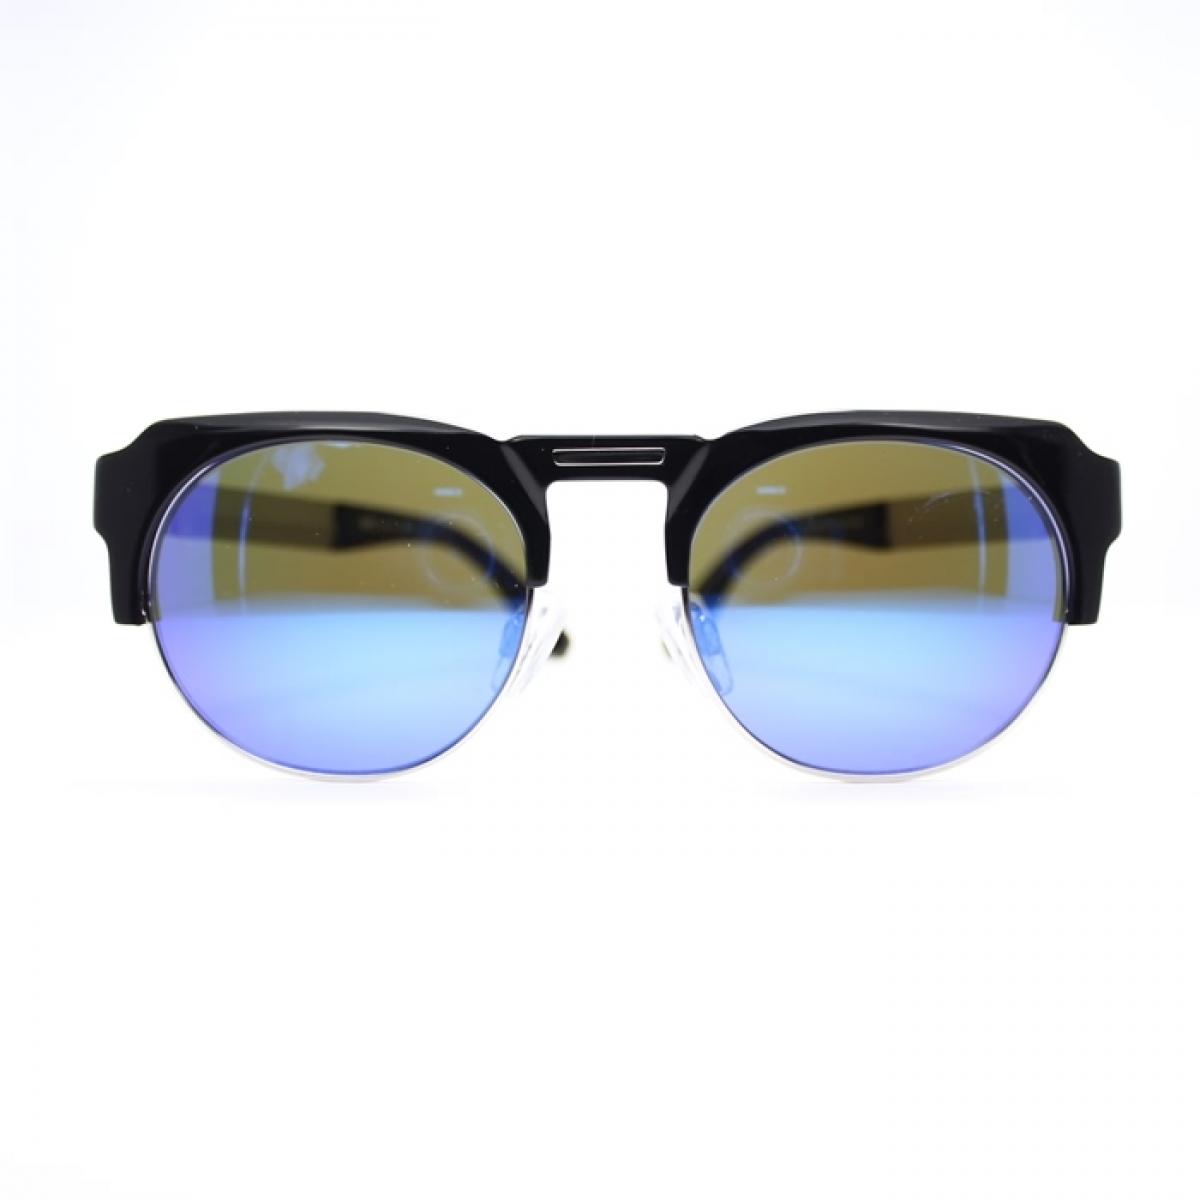 Dakota Smith L.A. 8036 C.A 1 Erkek Güneş Gözlüğü